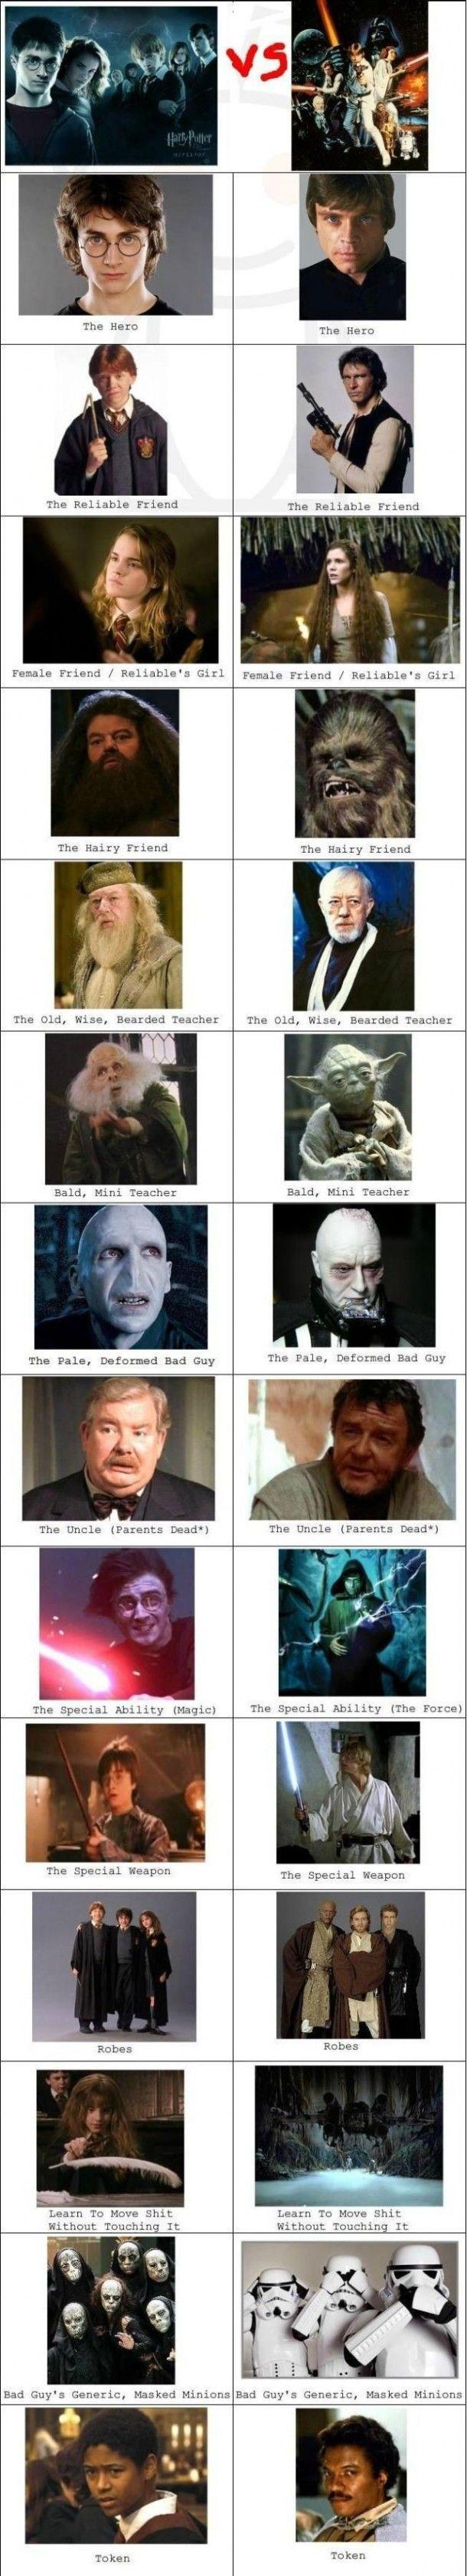 Harry Potter VS. StarWars